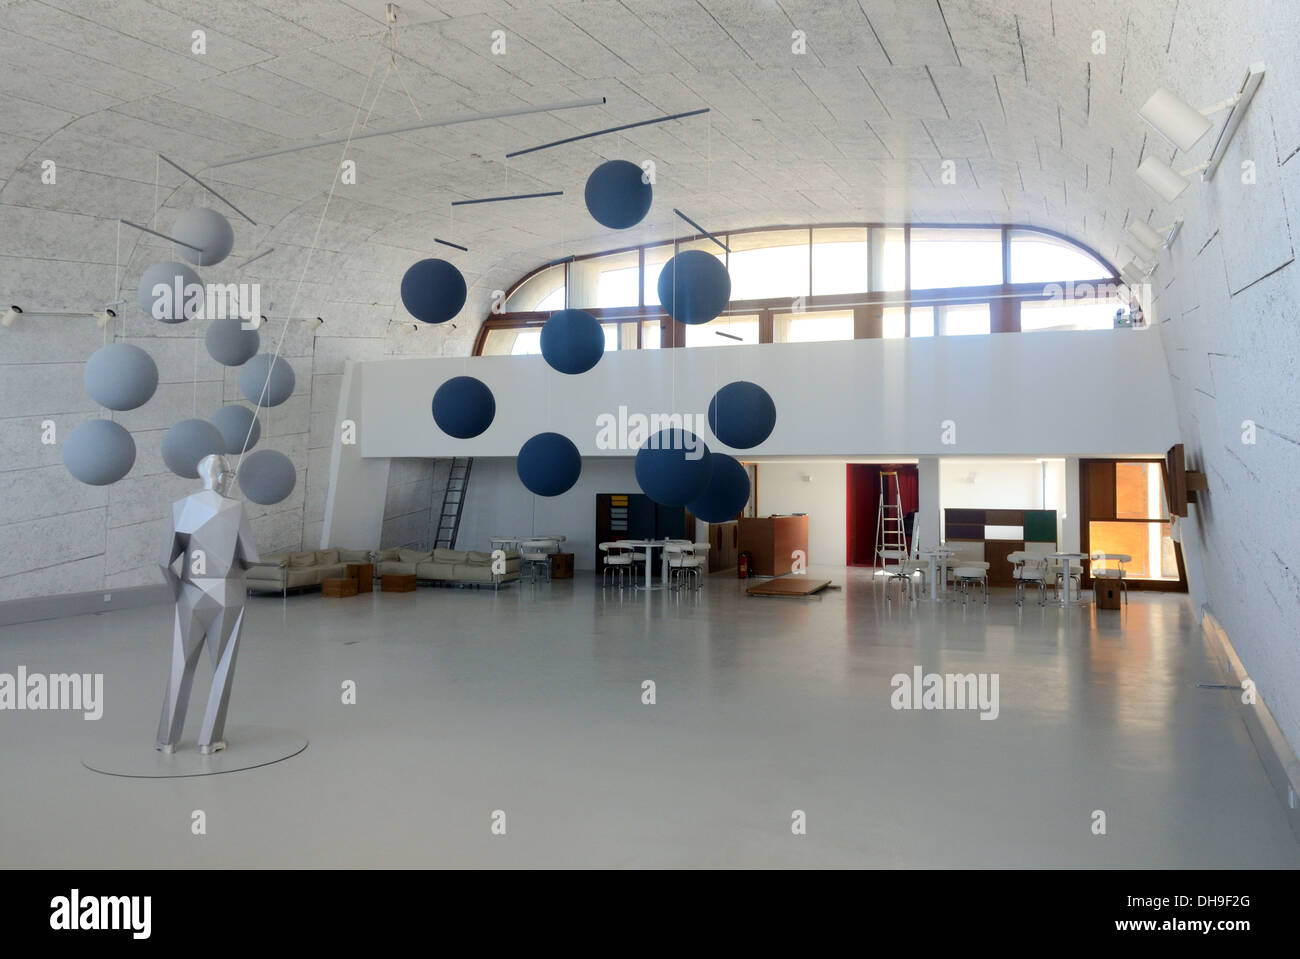 MAMO Art Gallery & Design Center Former Gymnasium Unité d'Habitation designed by Le Corbusier Marseille - Stock Image